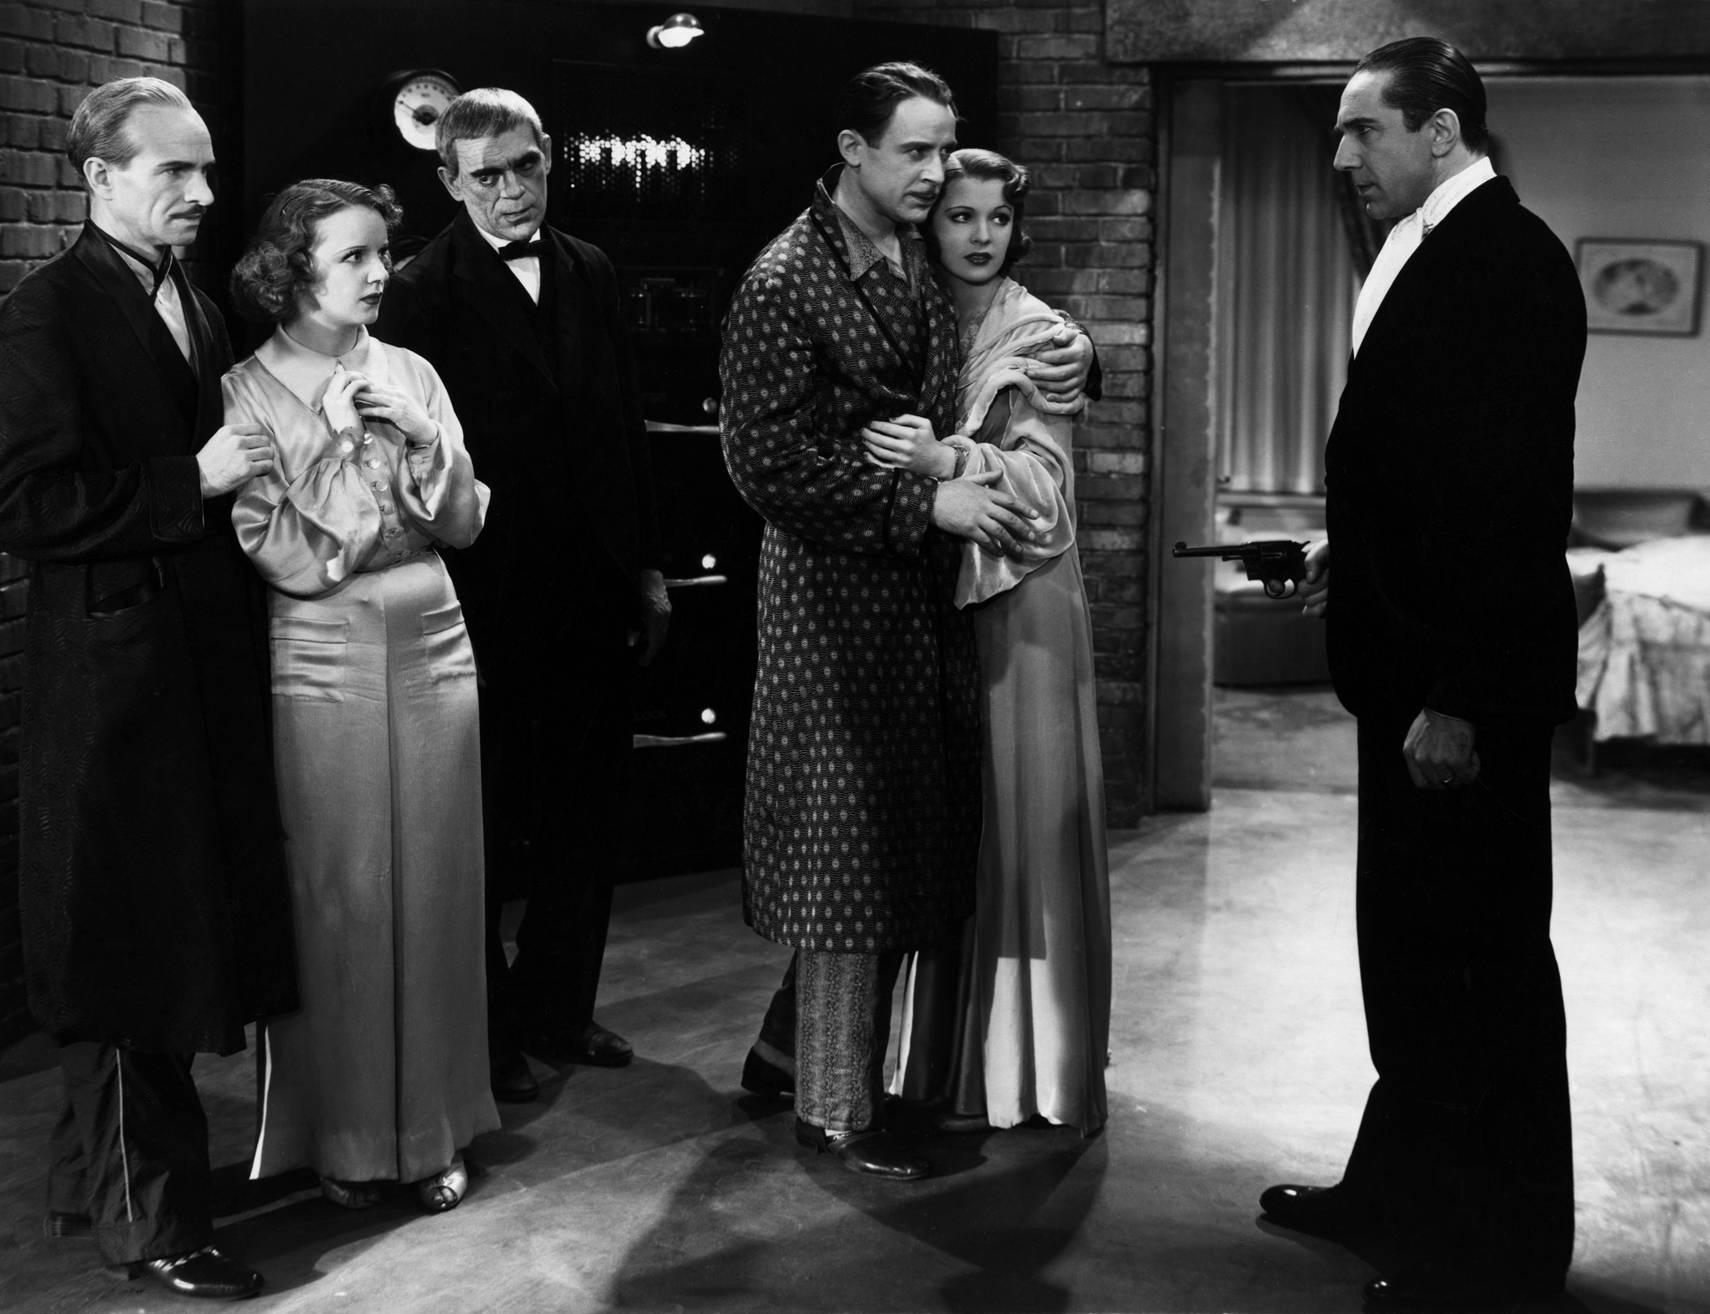 (L to R) Ian Wolfe, Inez Courtney, Boris Karloff, Lester Matthews, Irene Ware, Bela Lugosi